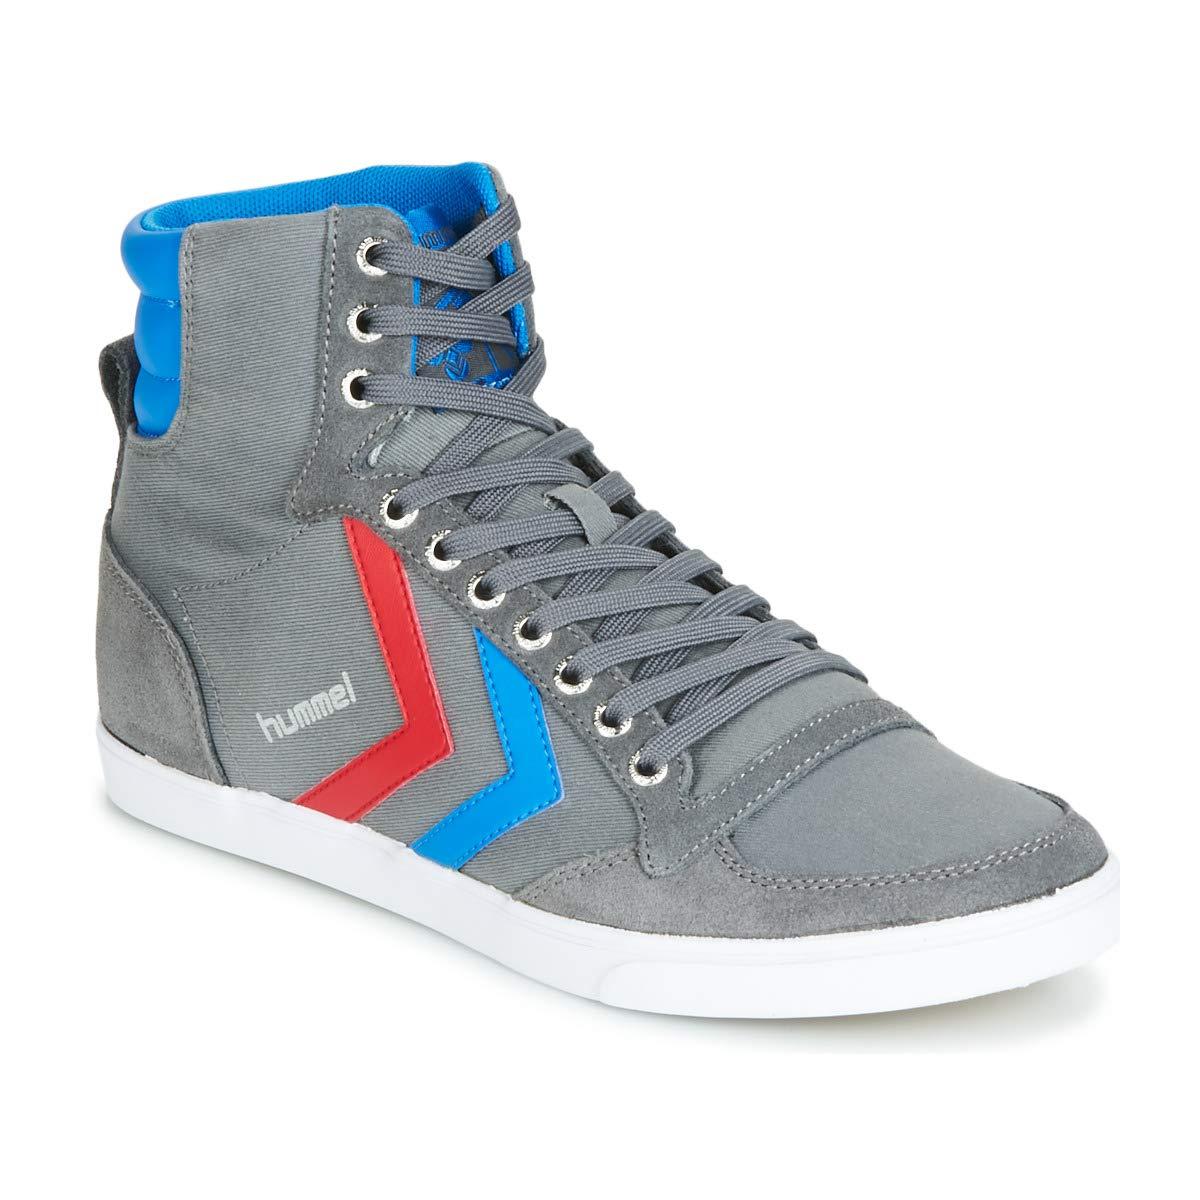 grau grau grau rot blau hummel Unisex-Erwachsene Slimmer Stadil High-Top  Qualität garantiert